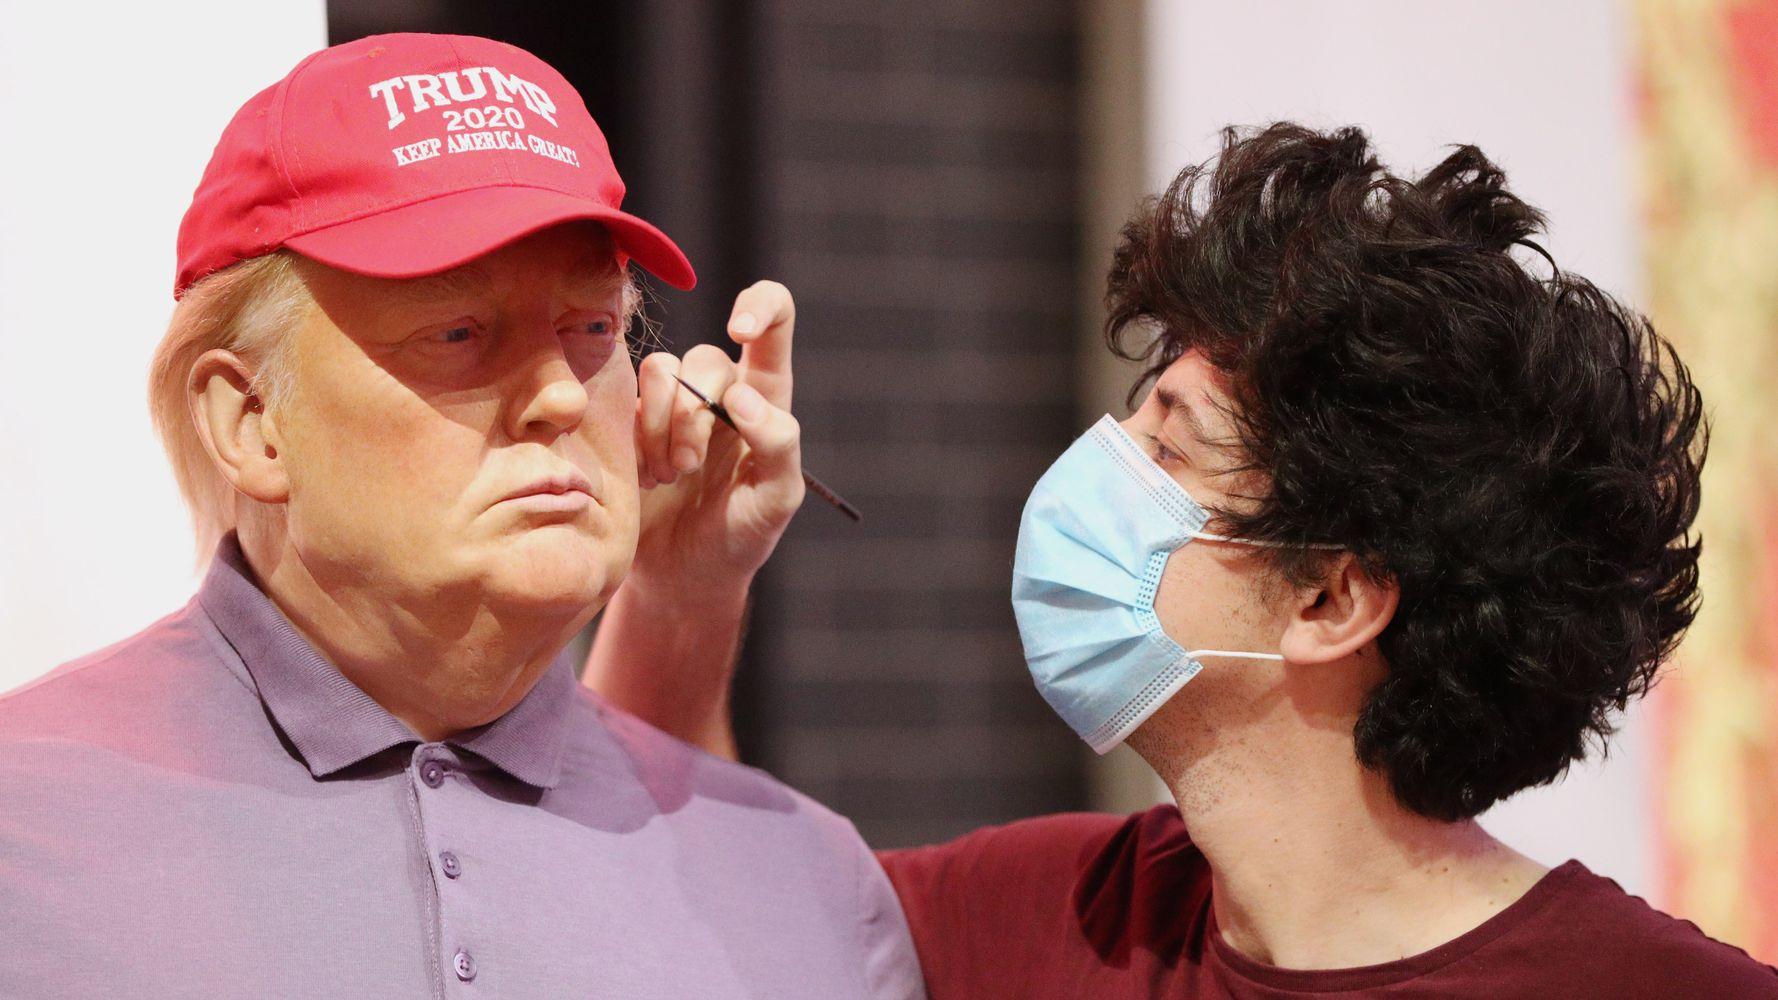 London Wax Museum Refits Donald Trump Figure In Golf Attire Following Election Loss